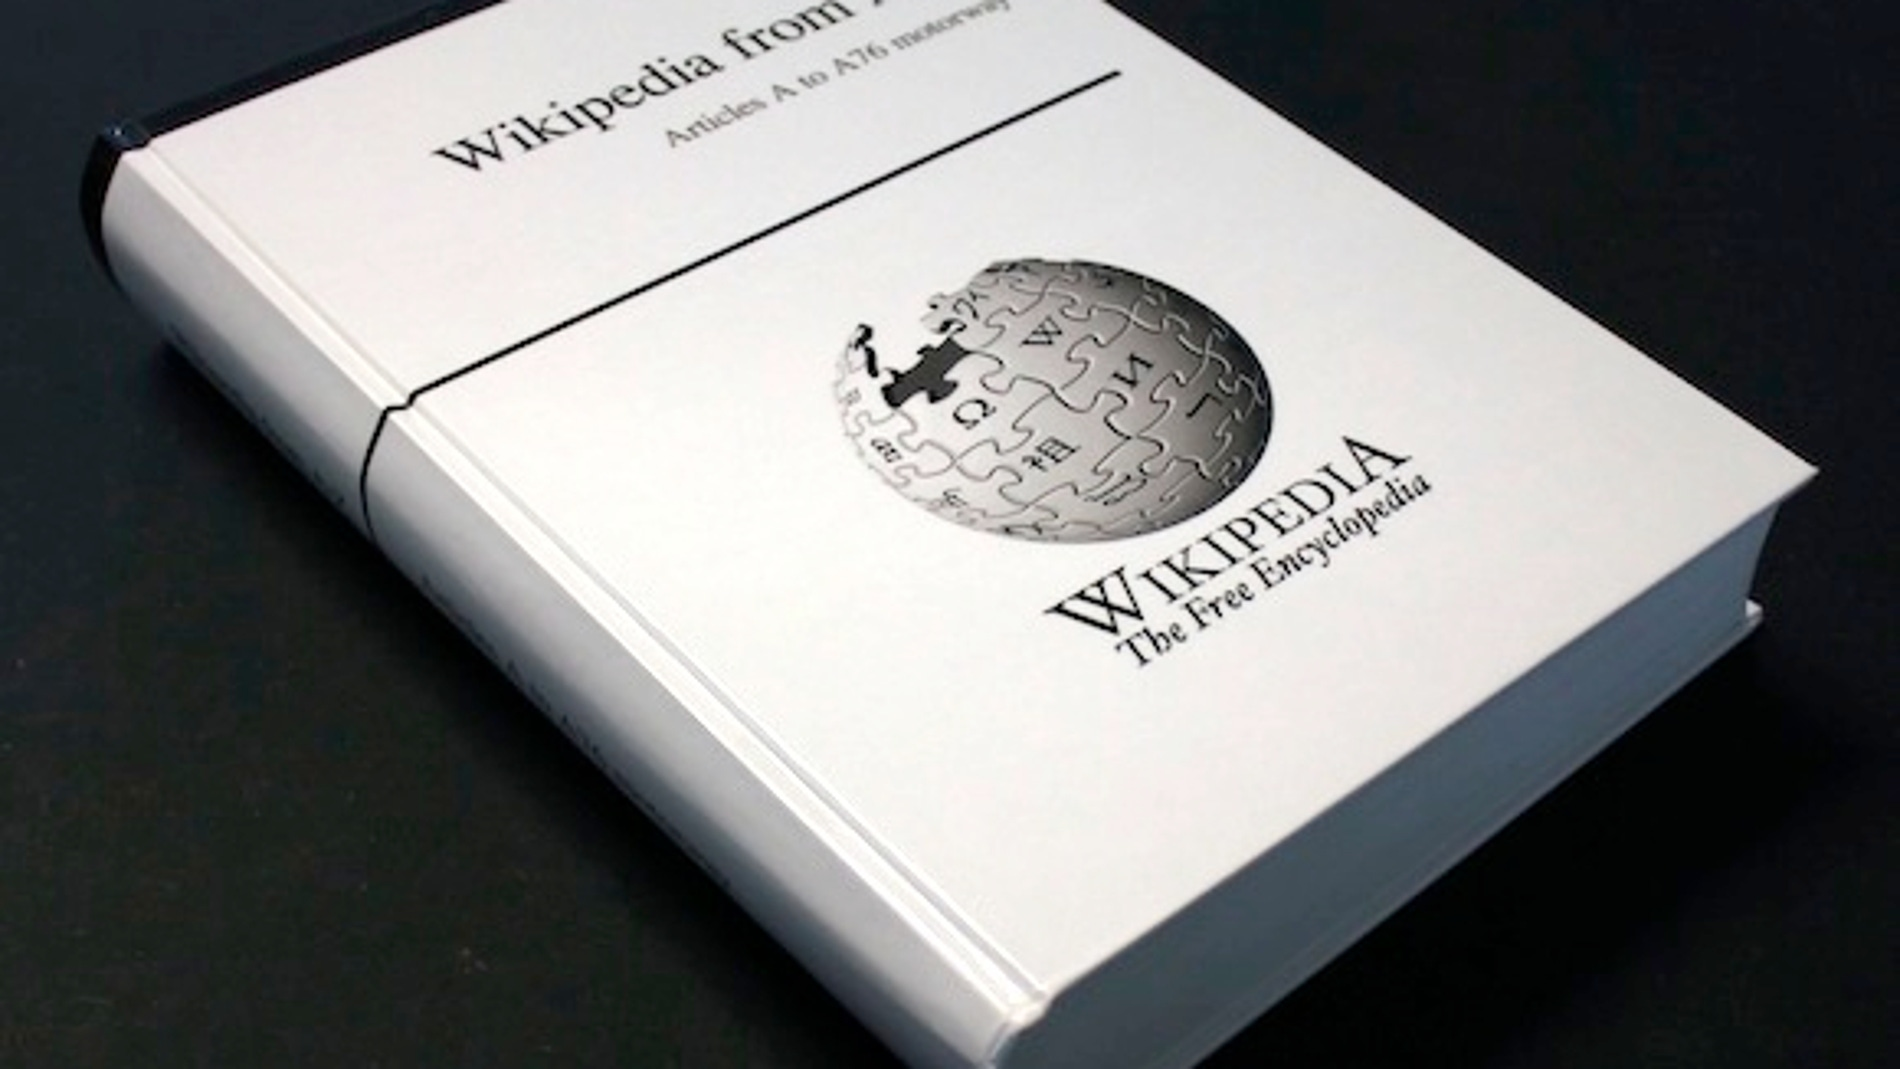 Un tomo de la Wikipedia inglesa en papel